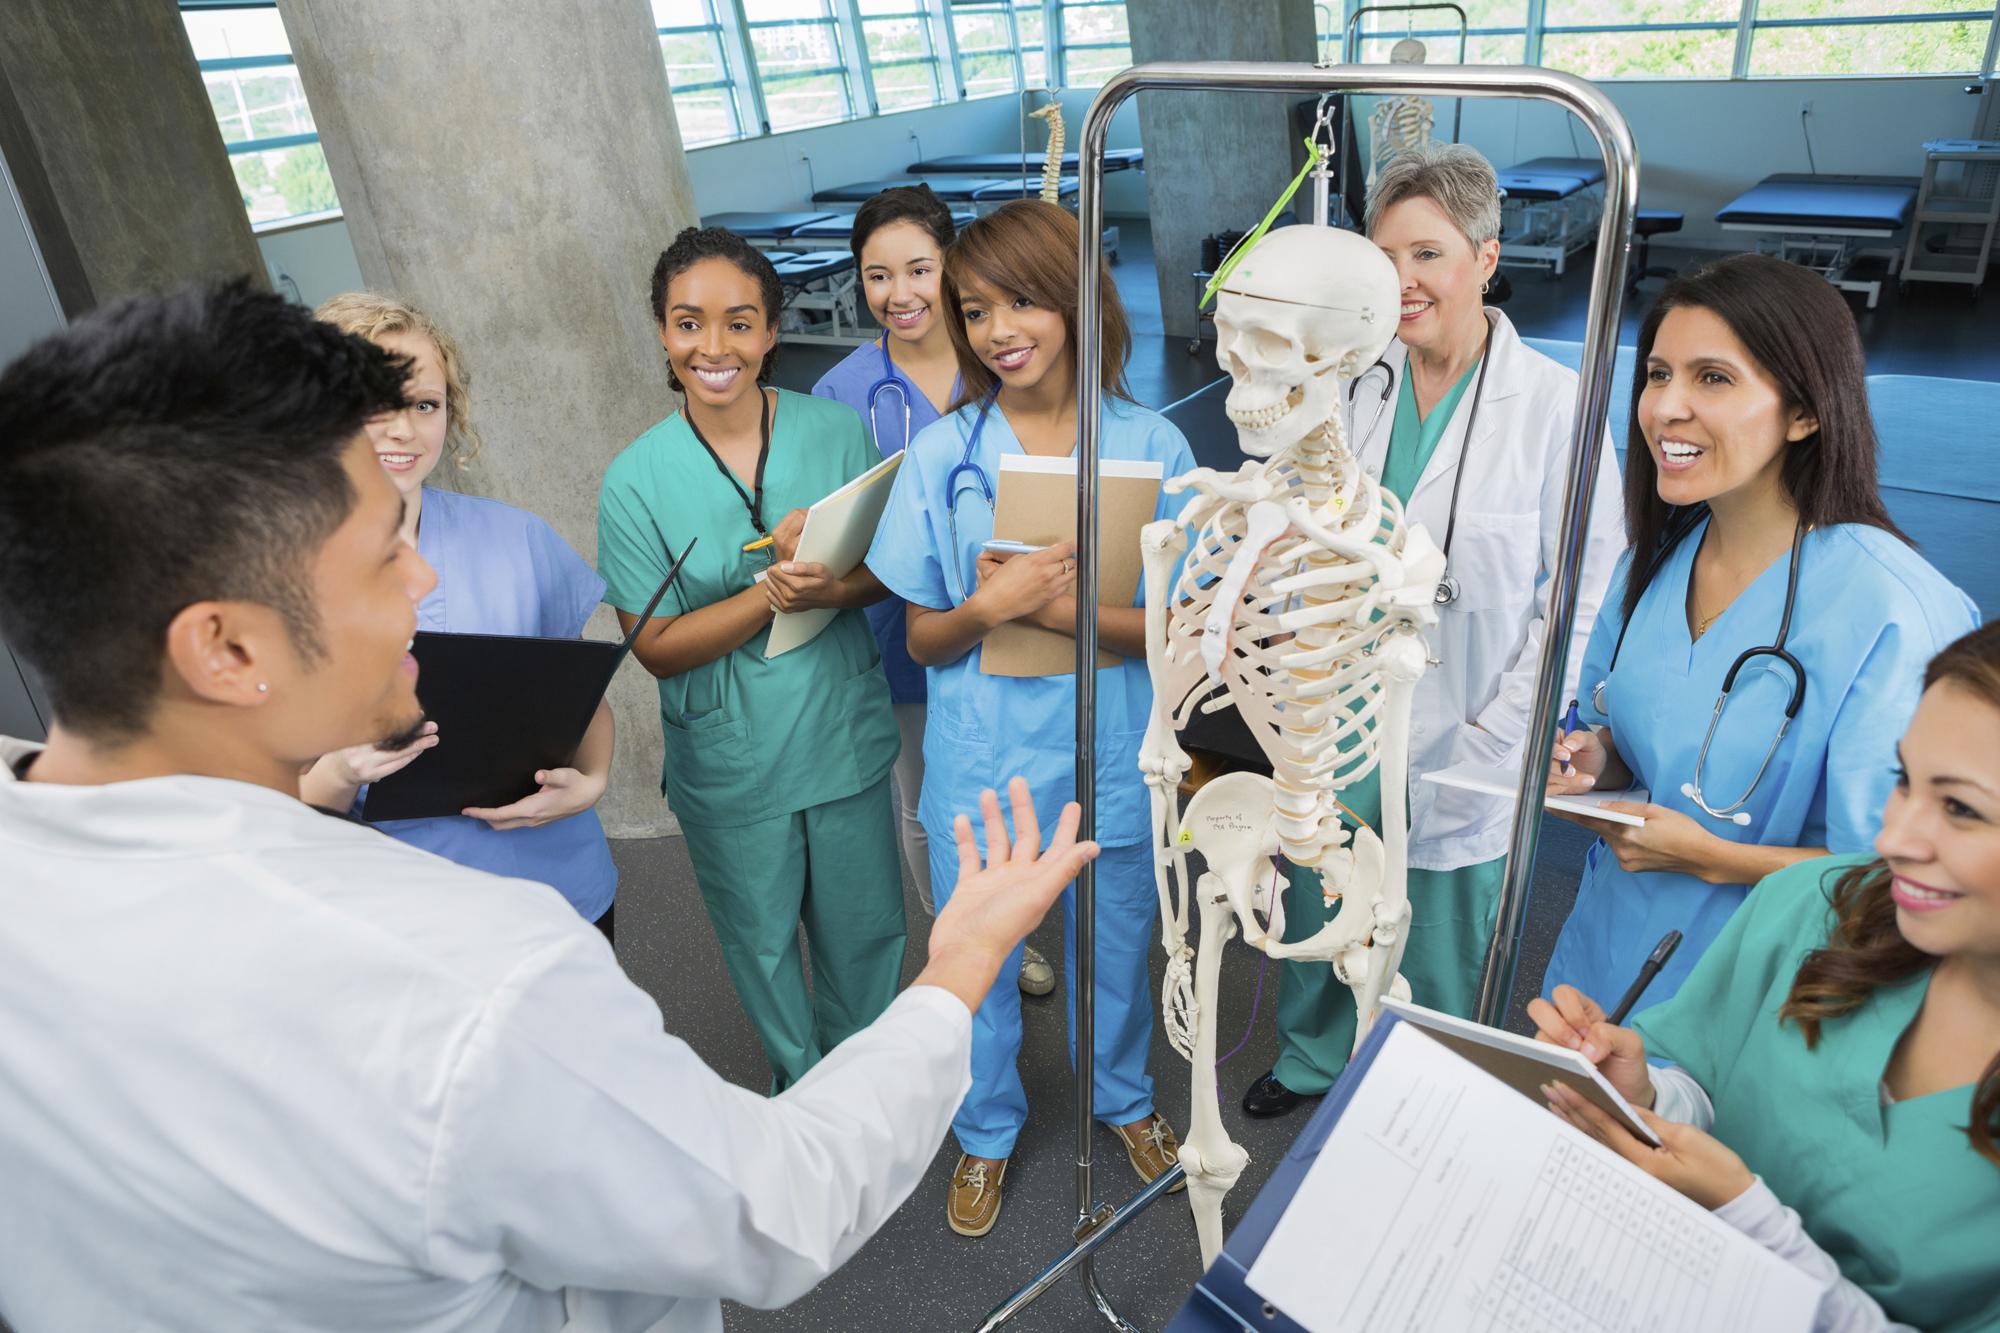 student doctor program back - HD1200×800